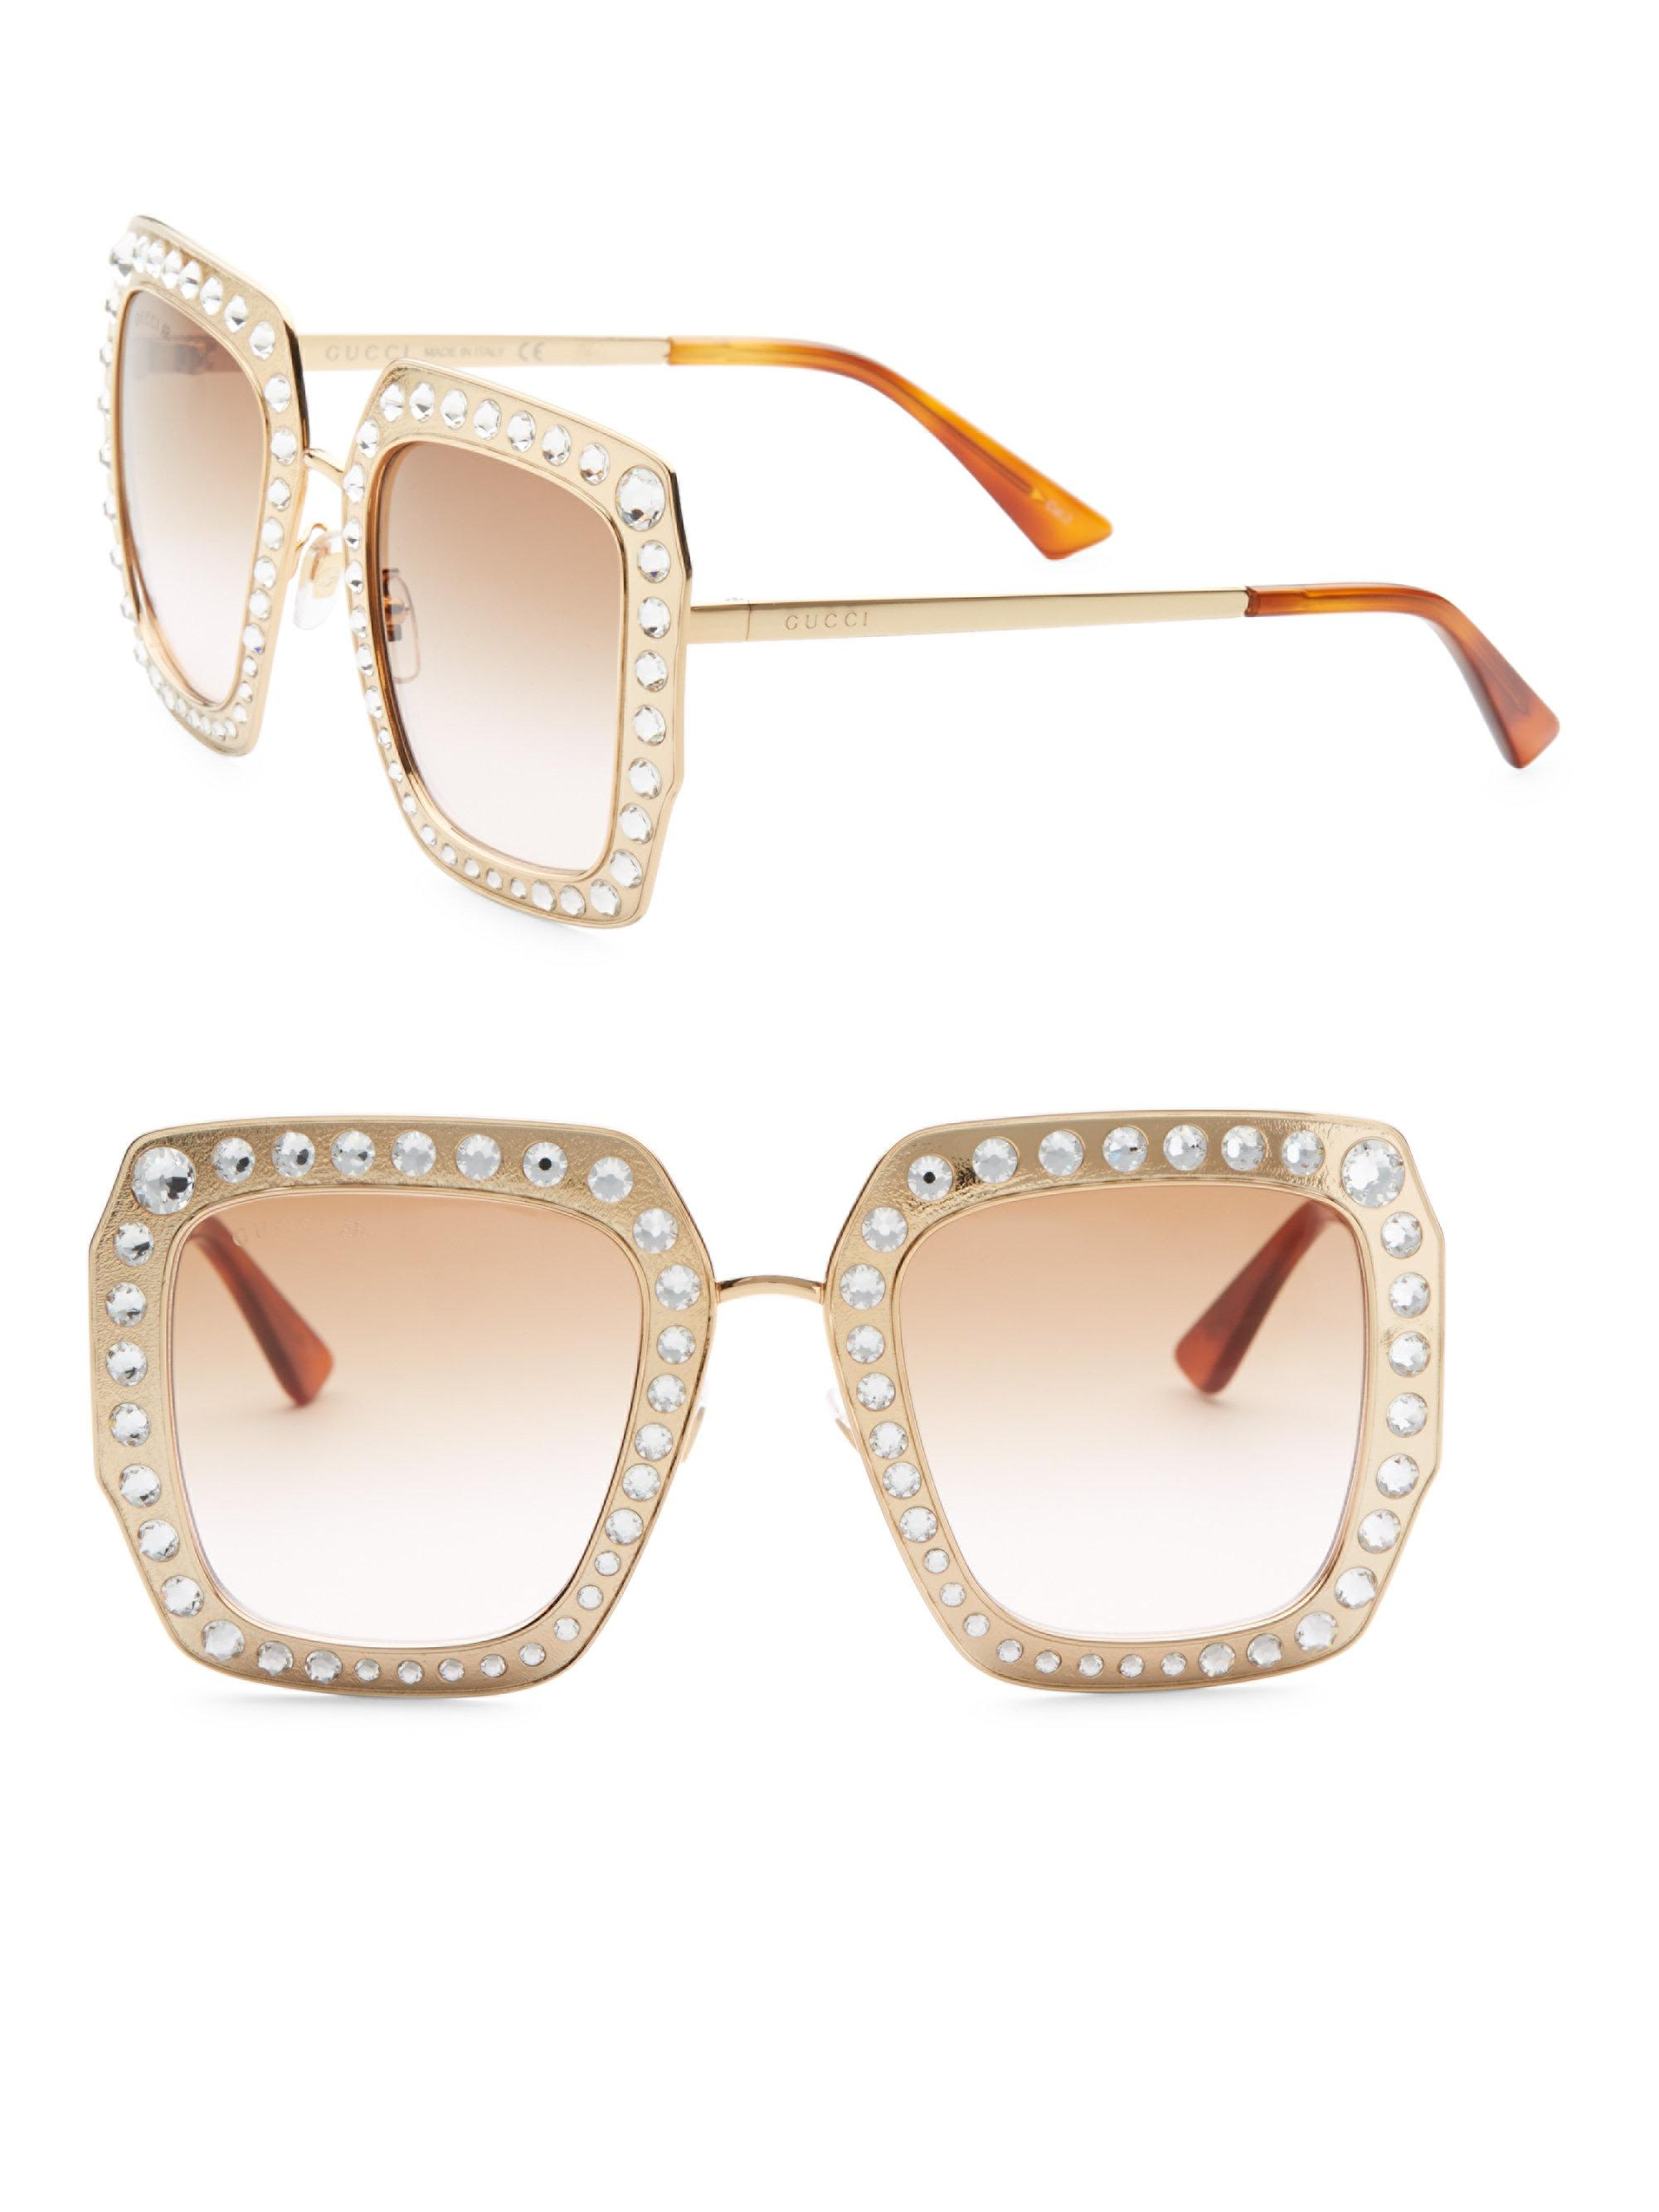 5ec219f2b837 Lyst - Gucci 52mm Crystal-studded Square Sunglasses in Metallic